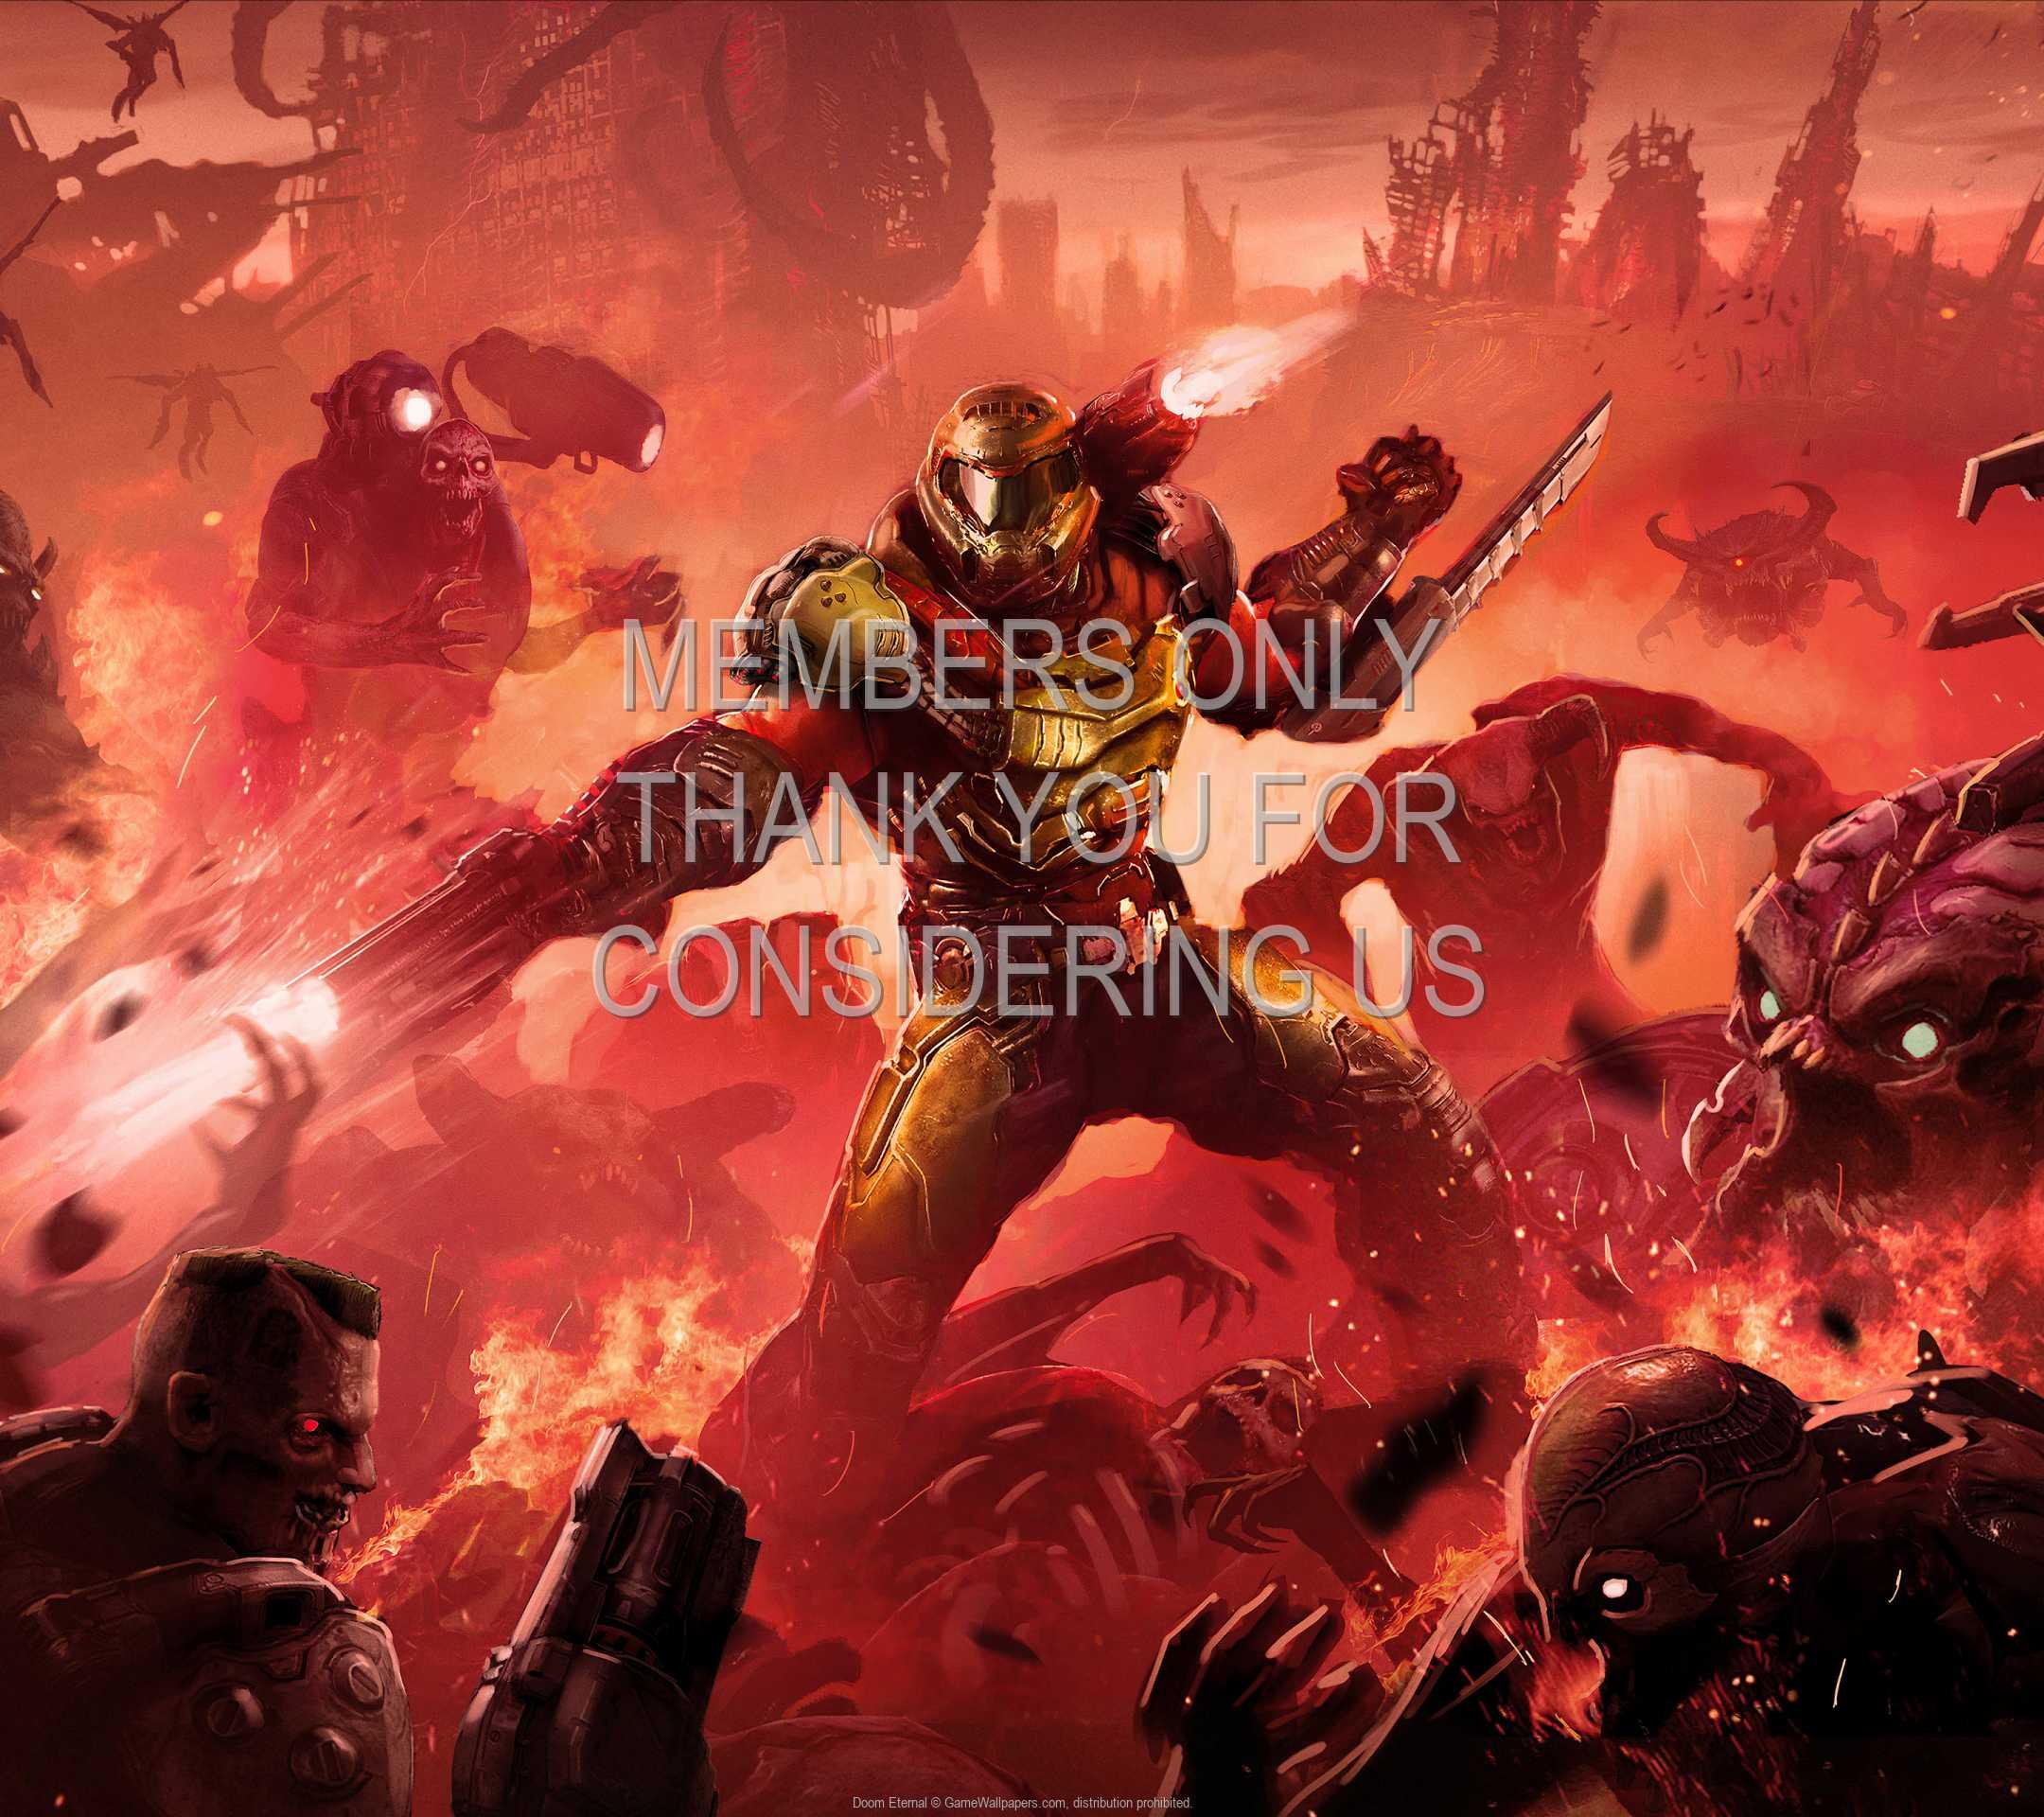 Doom Eternal 1080p Horizontal Mobile wallpaper or background 18